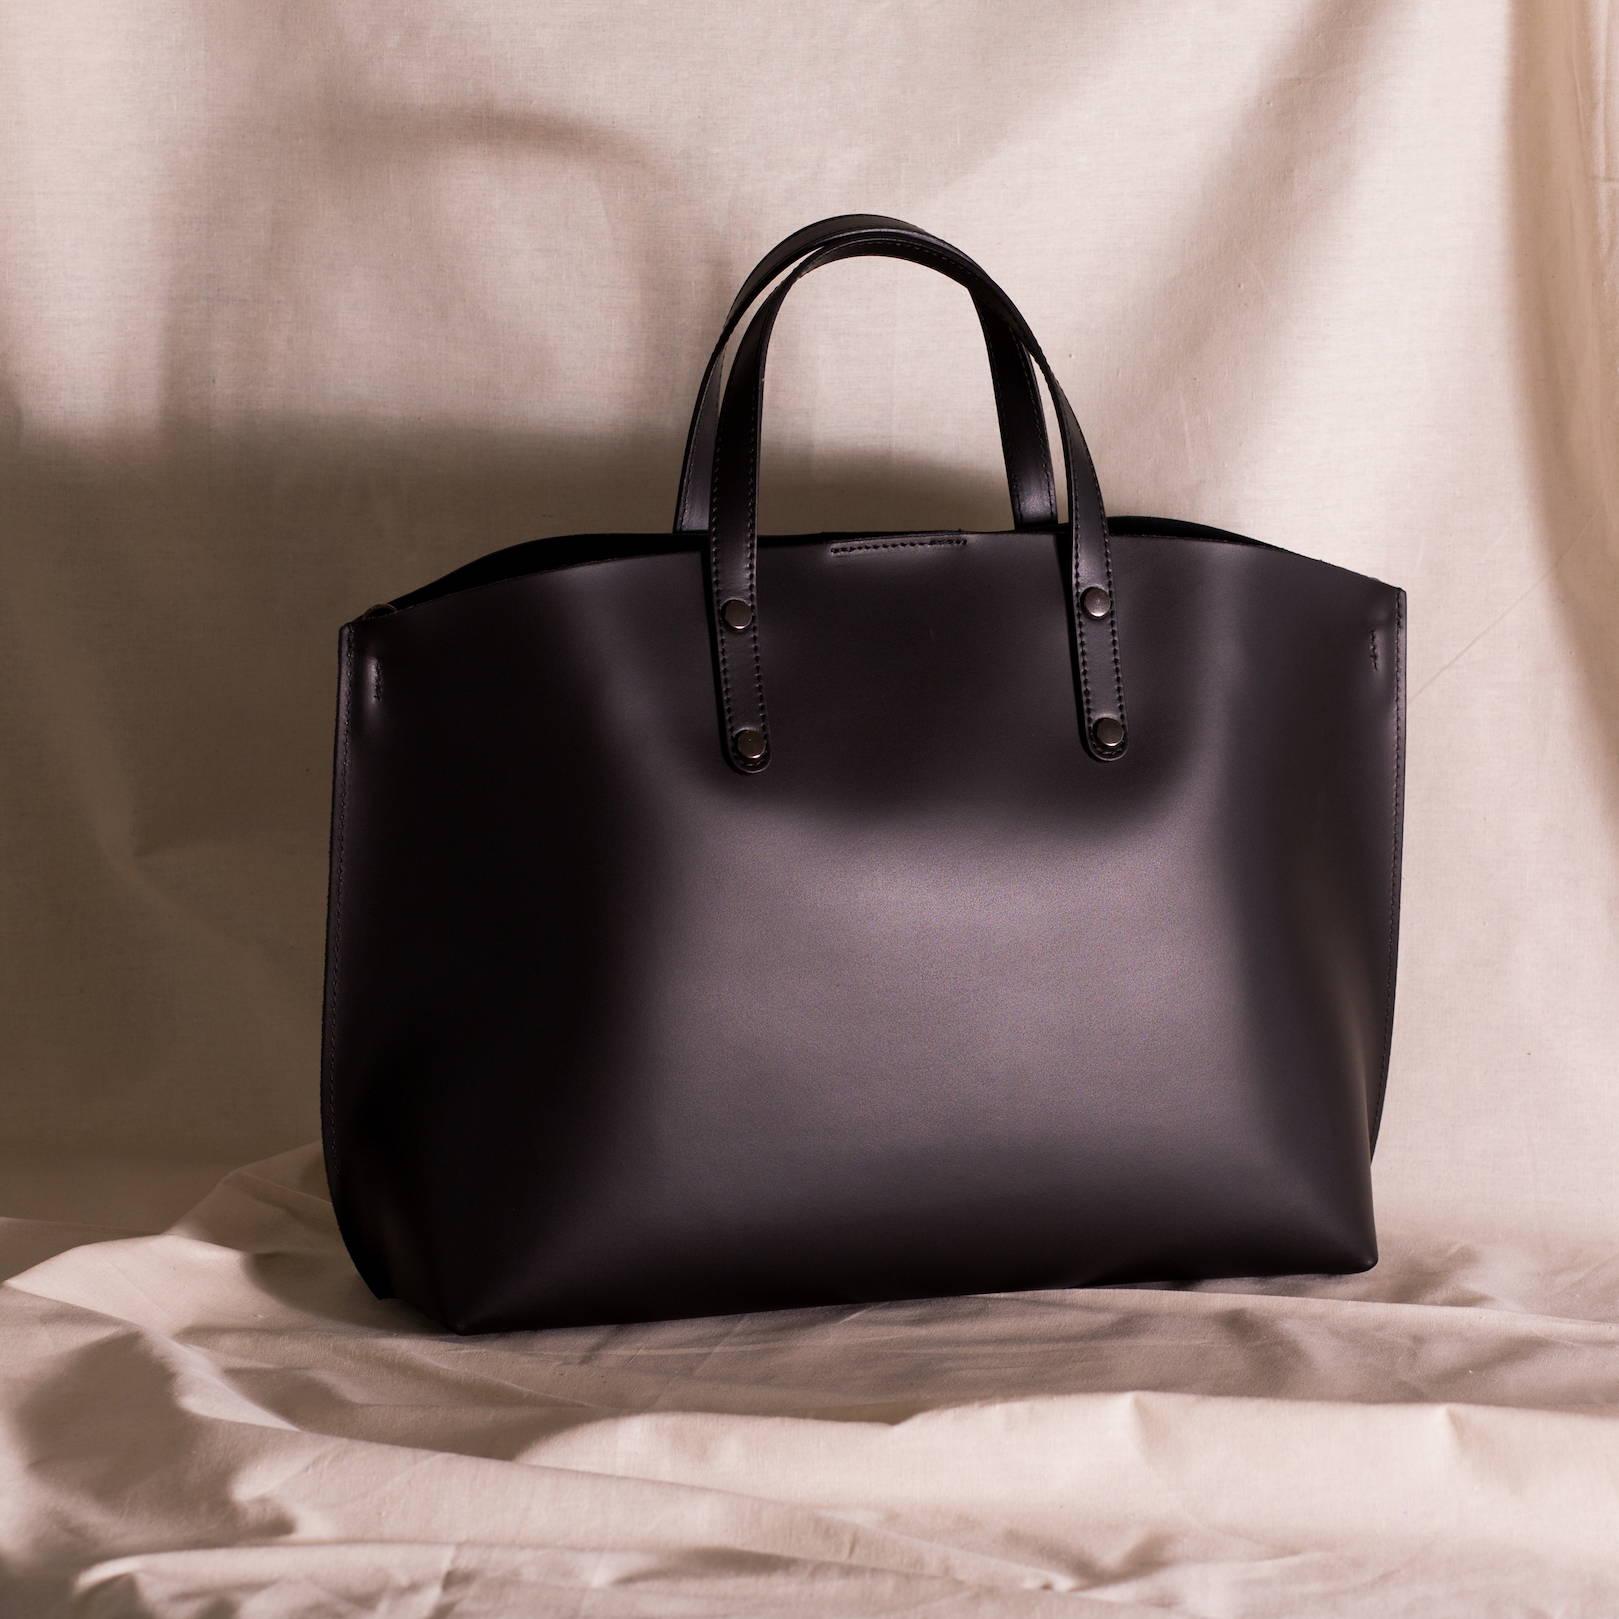 VESTIRSI leather handbag handmade in Italy TONIA black work office handbag